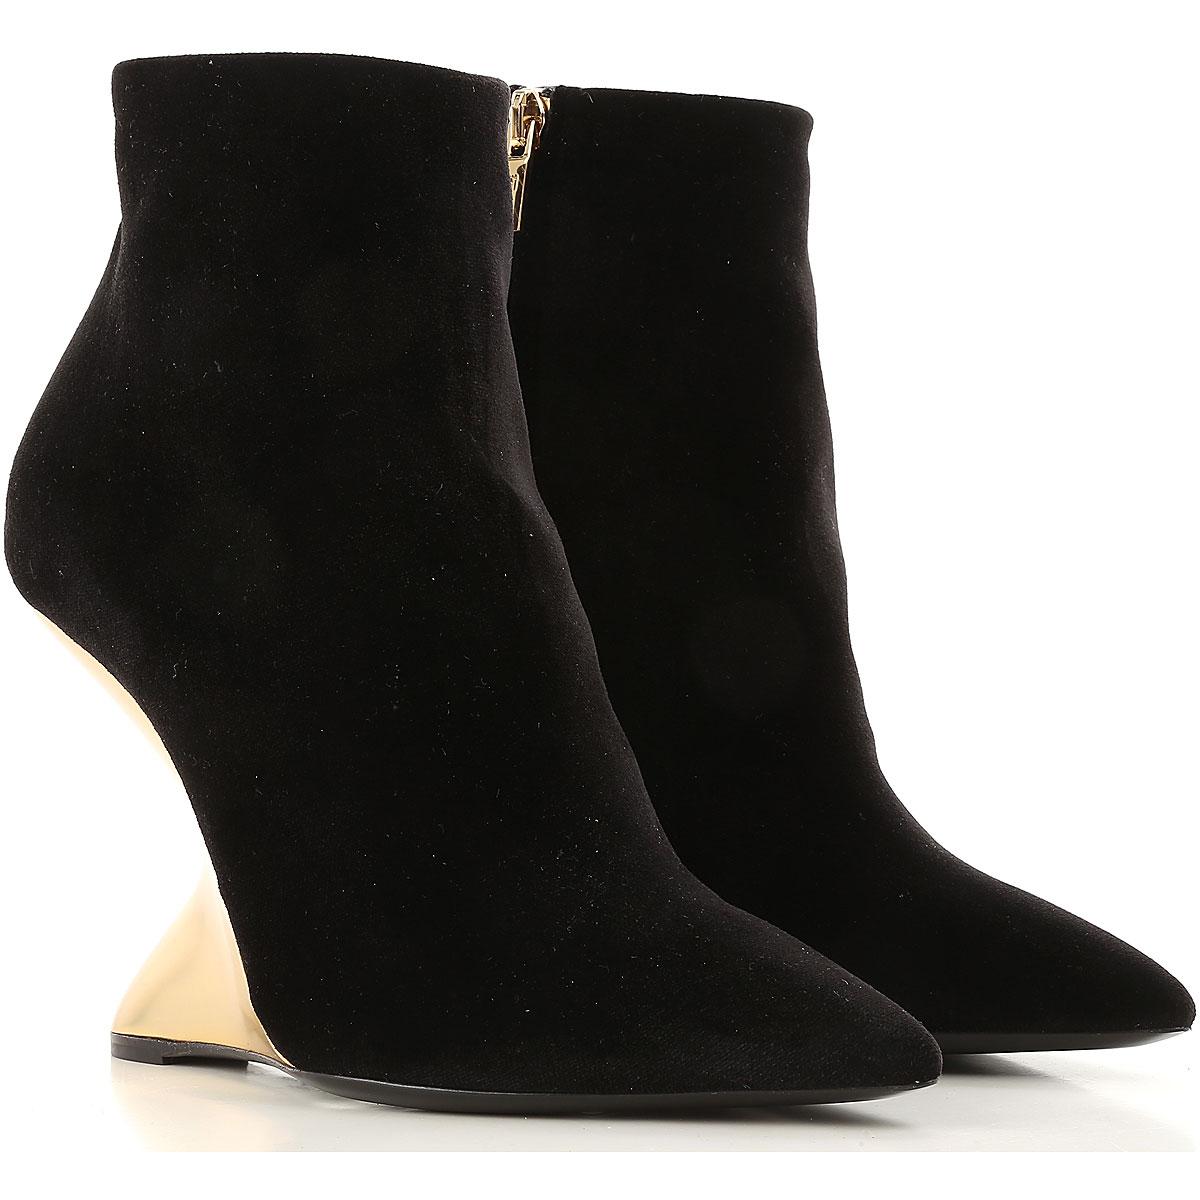 Image of Salvatore Ferragamo Boots for Women, Booties On Sale in Outlet, Black, Velvet, 2017, 6.5 7